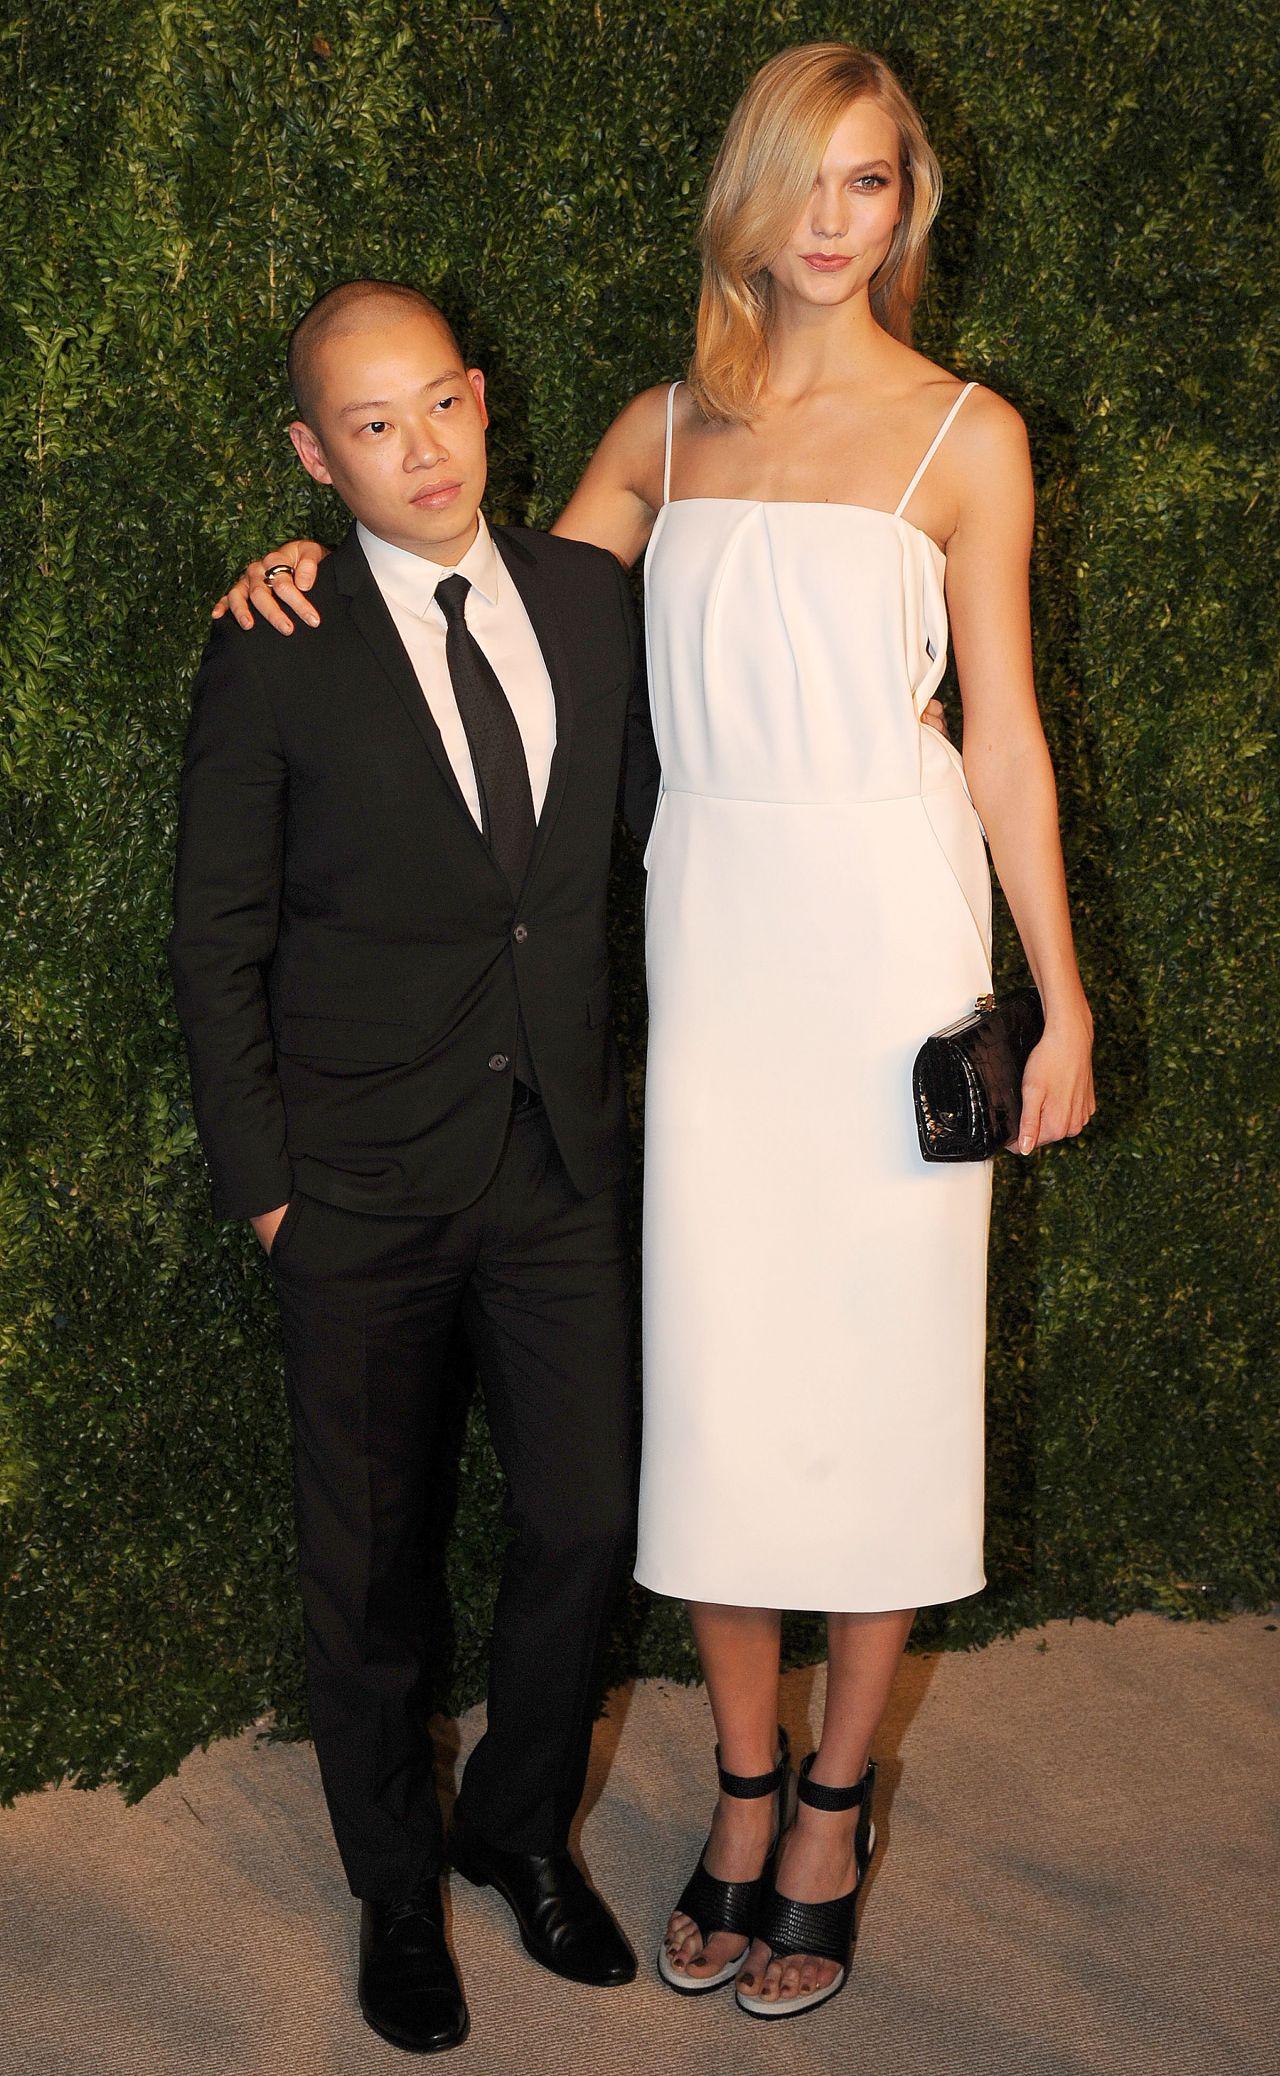 Karlie Kloss - 2014 CFDA/Vogue Fashion Fund Awards in New York City